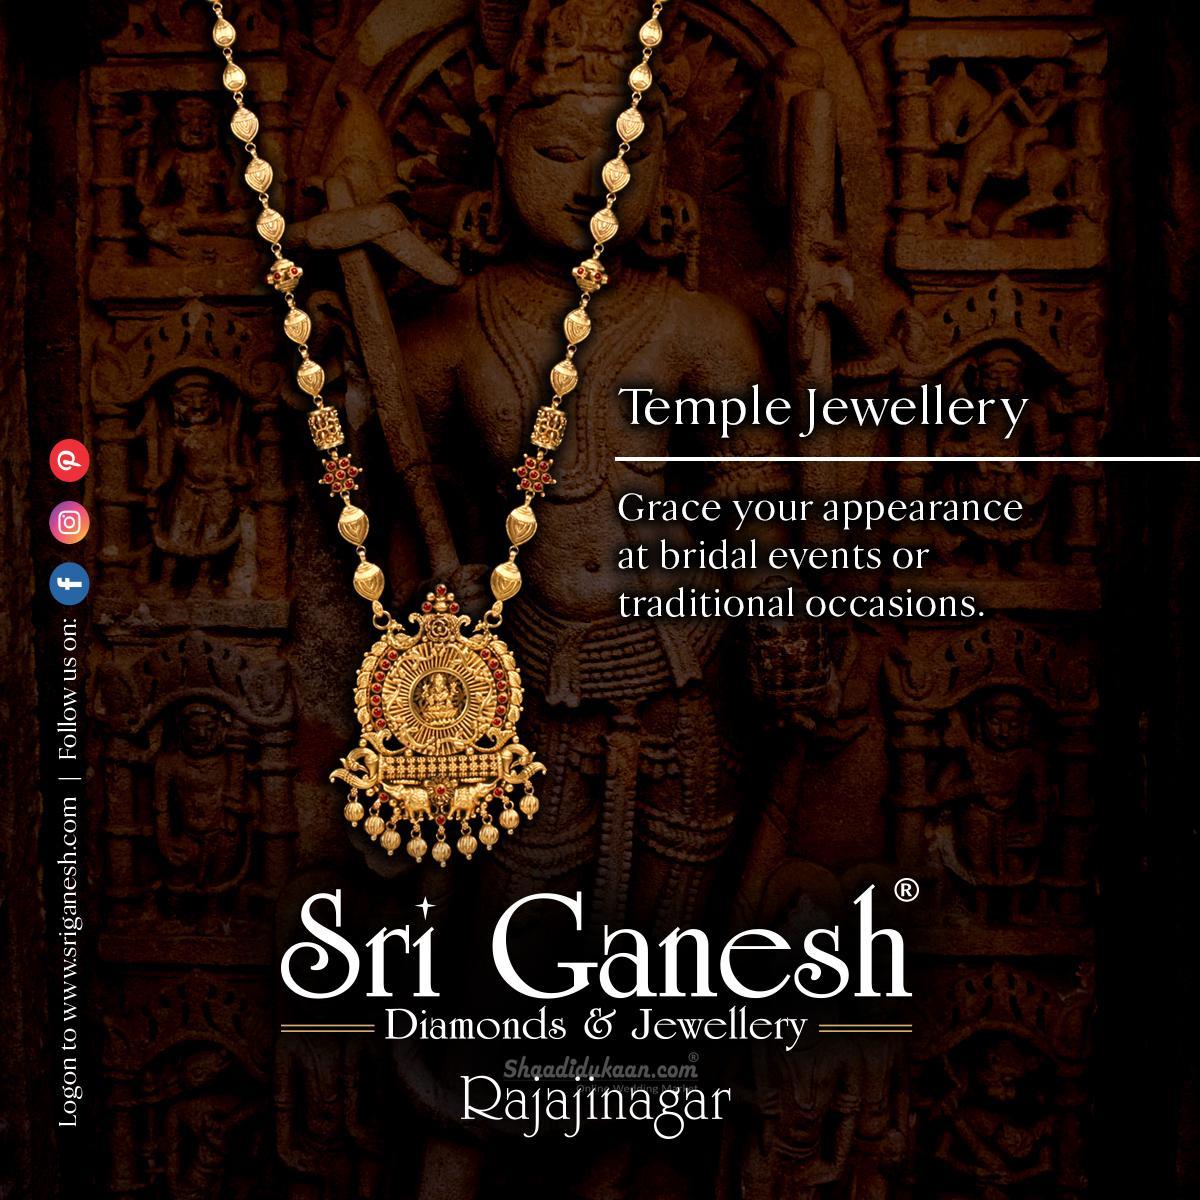 Sri Ganesh Diamond and Jewellery